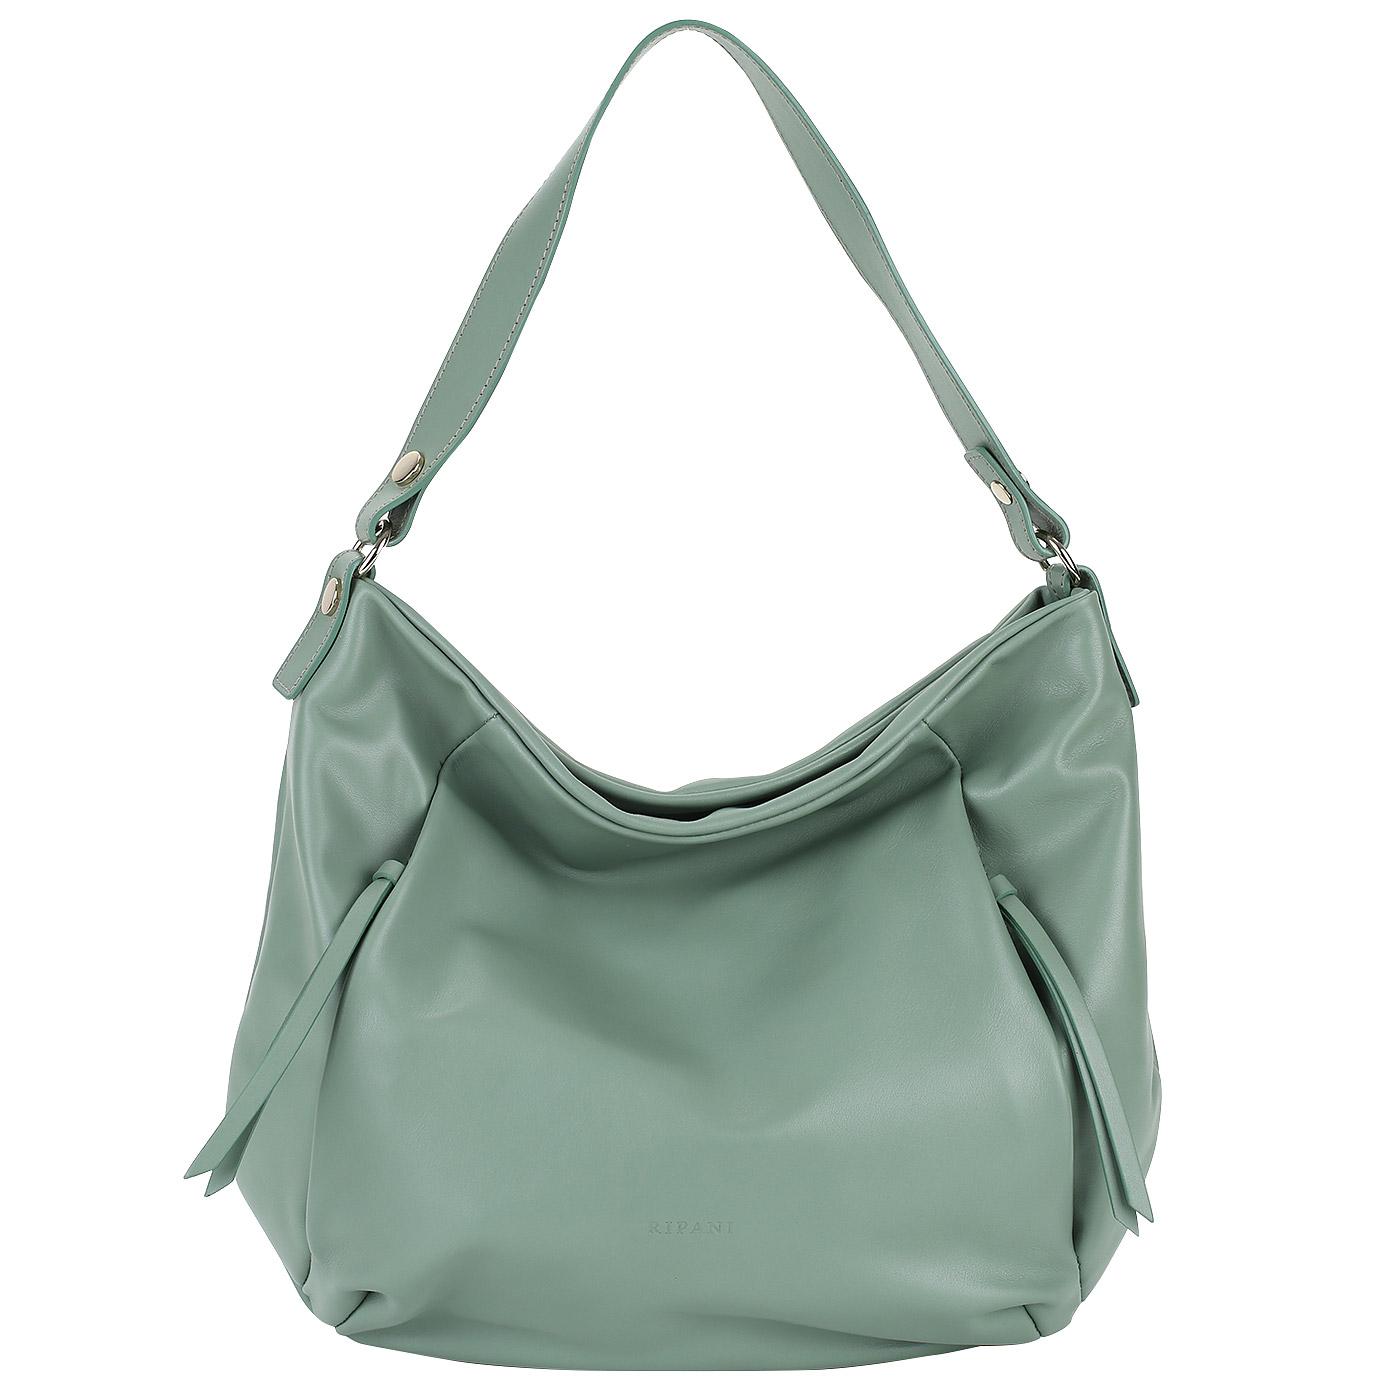 e583ebc045d7 Женская сумка-хобо из кожи Ripani Lime 7836LL.00051 - 2000557807136 ...